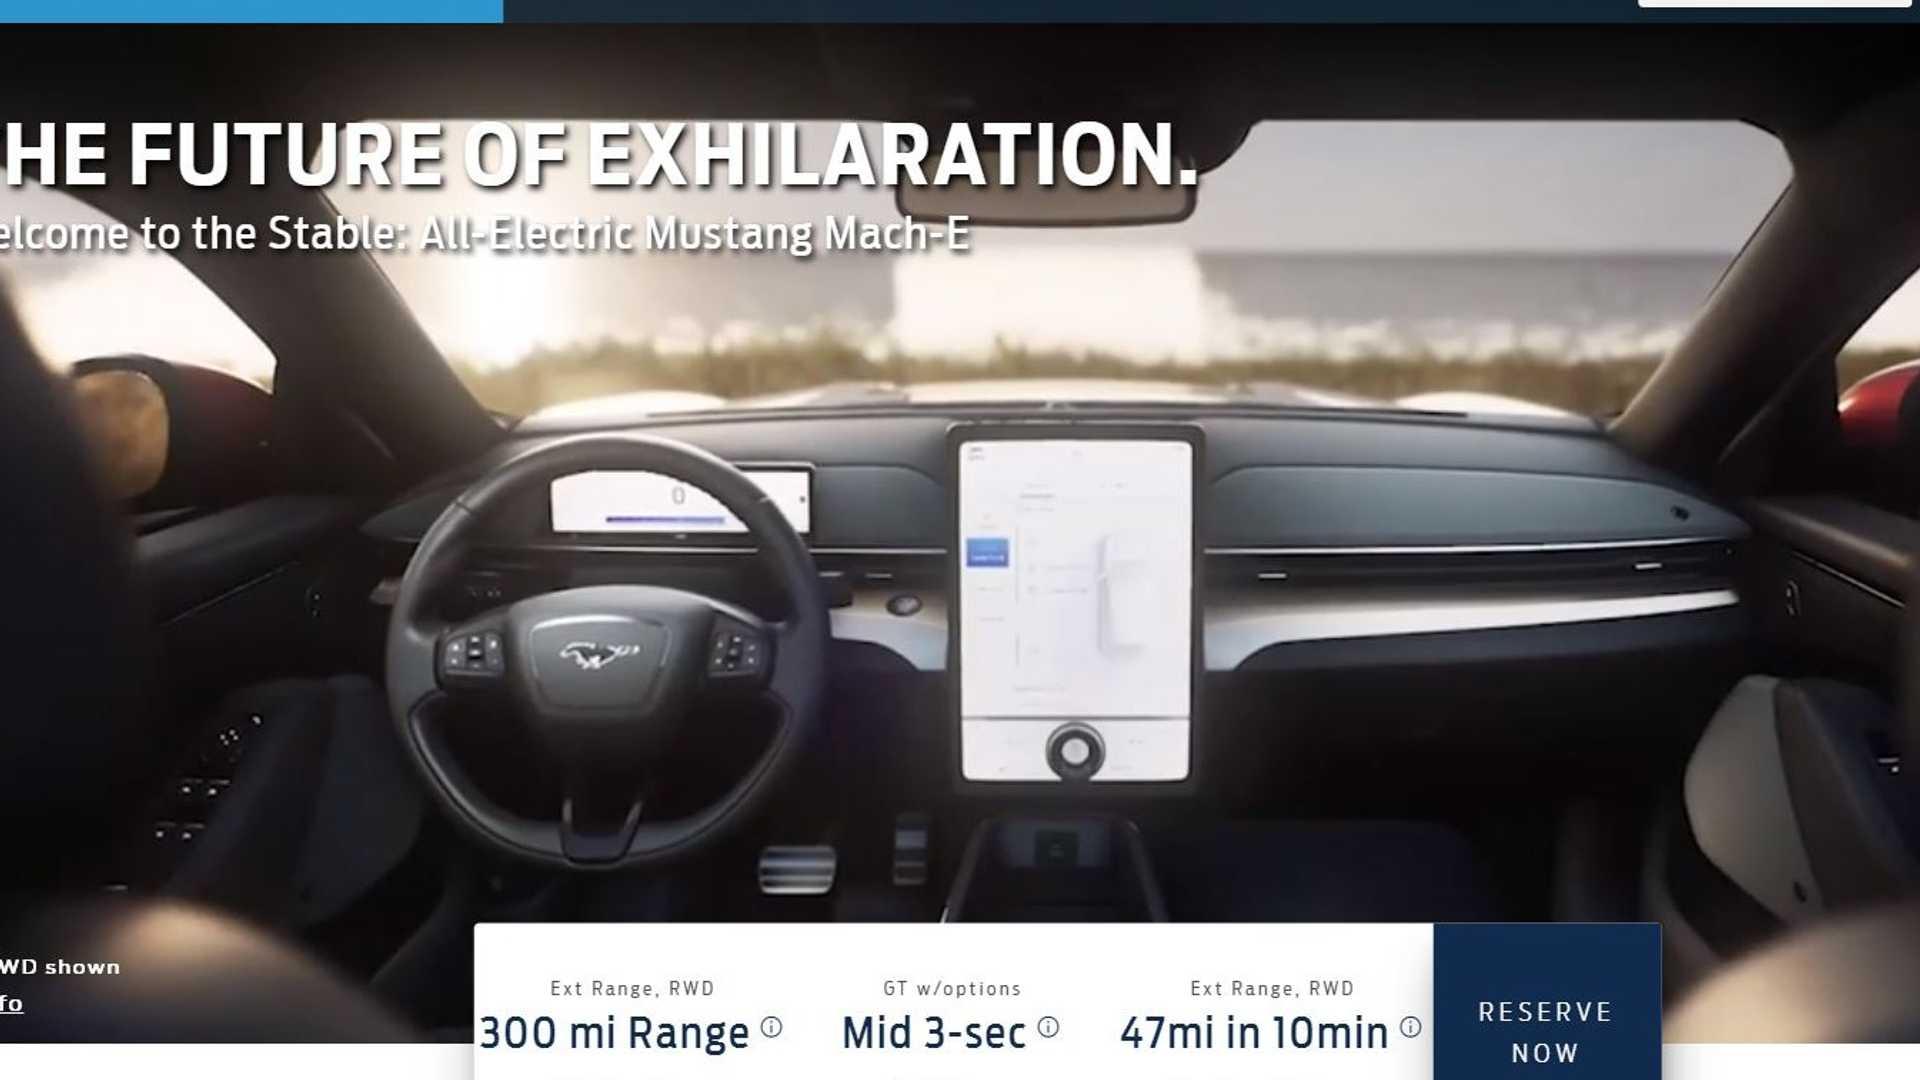 Interior Mustang Mach-E